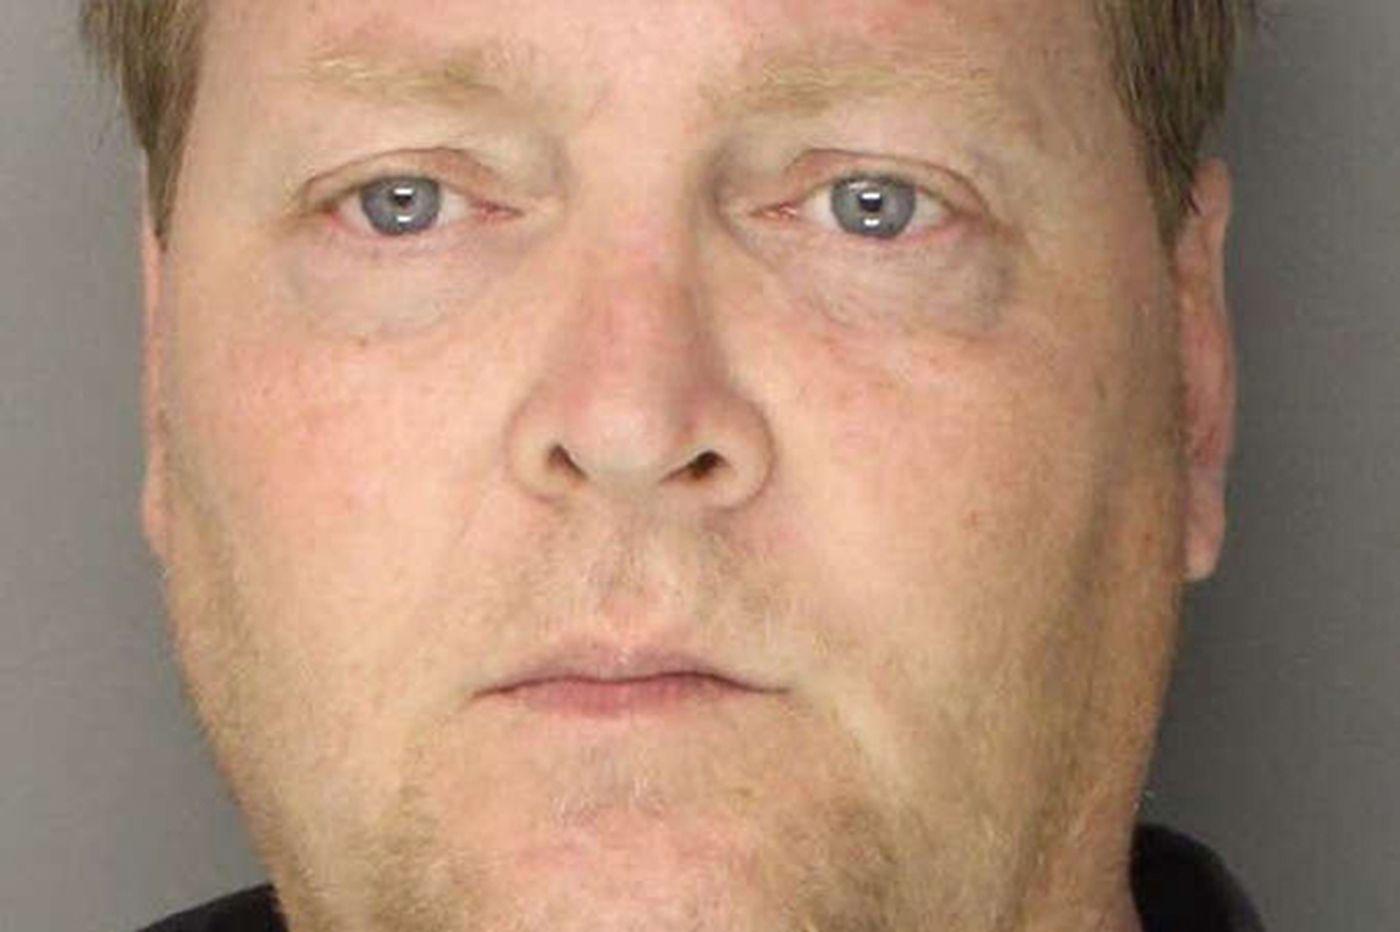 Plotts pleads not guilty in Delco hospital shootings